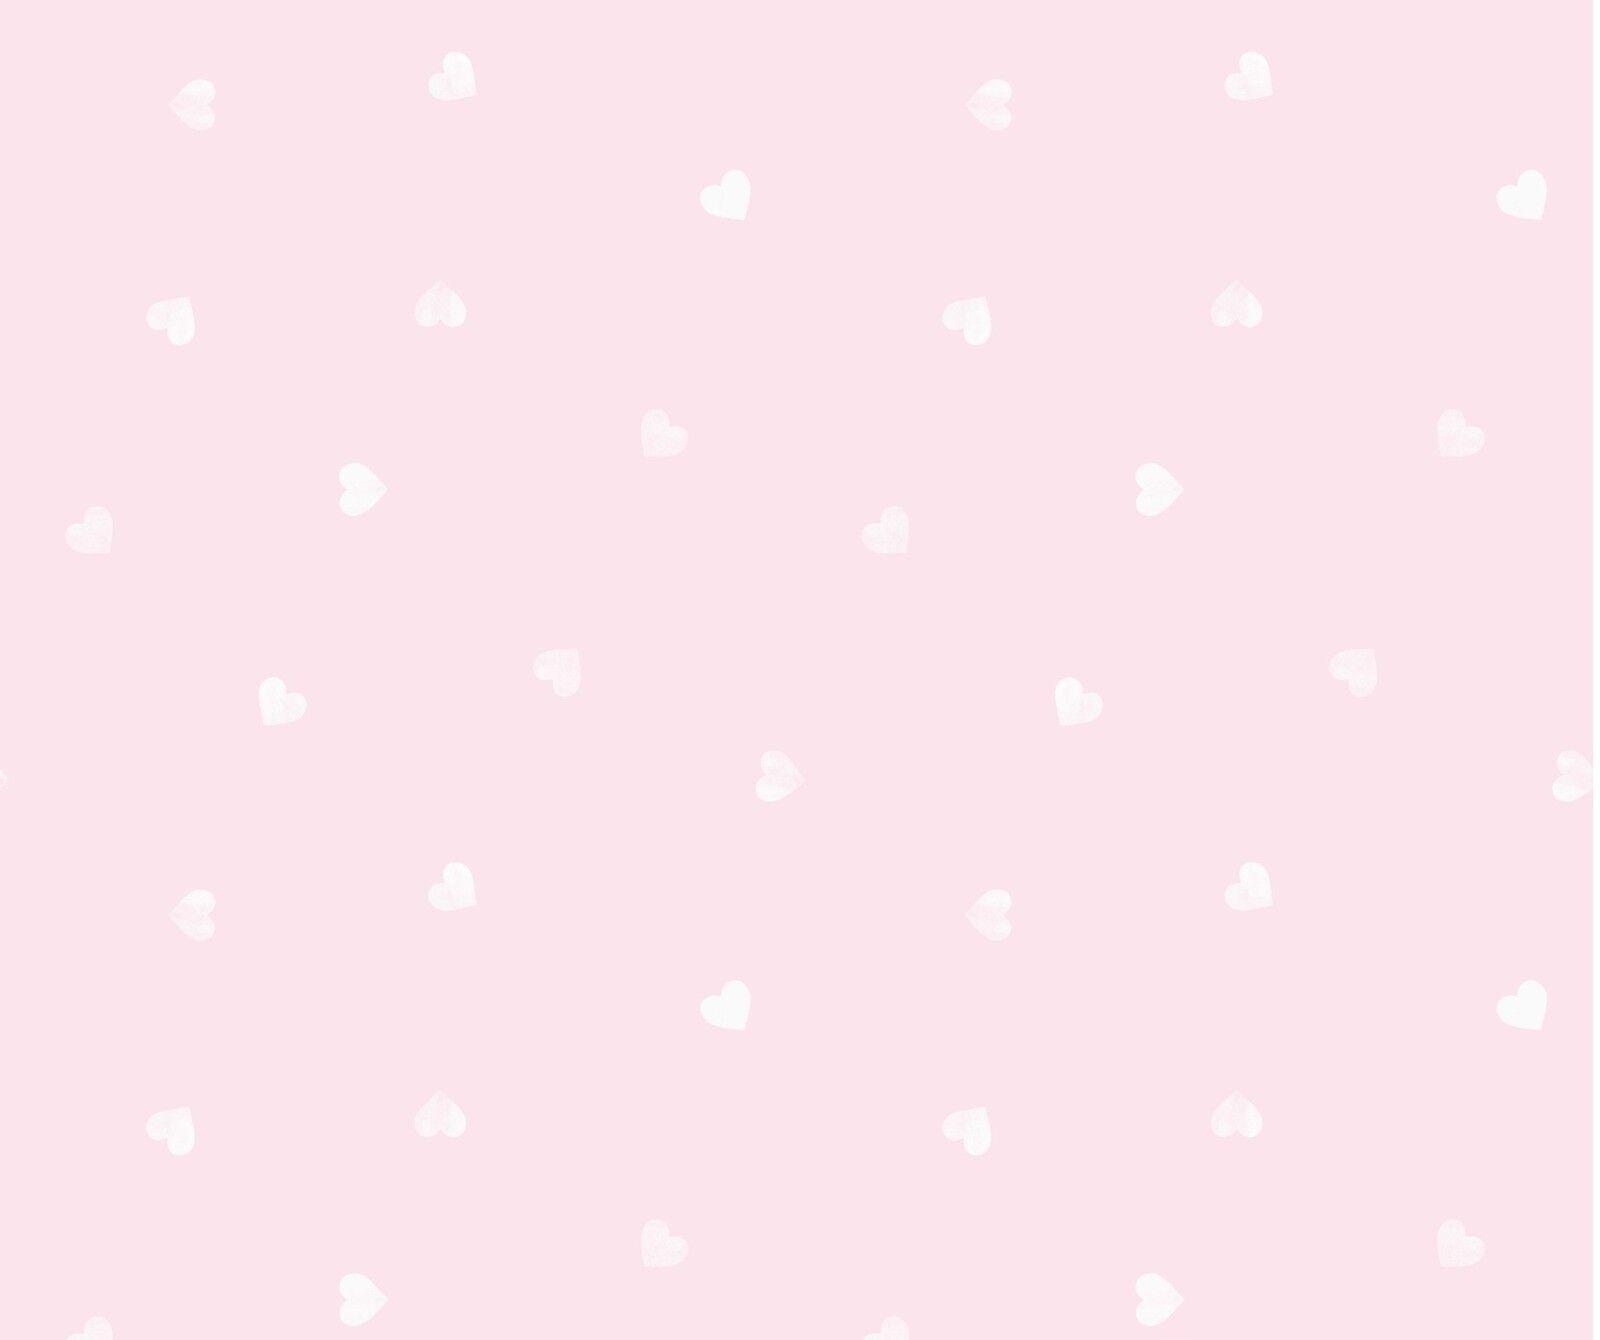 Details About Pink White Love Hearts Girls Childrens Kids Nursery Baby Wallpaper Dl21118